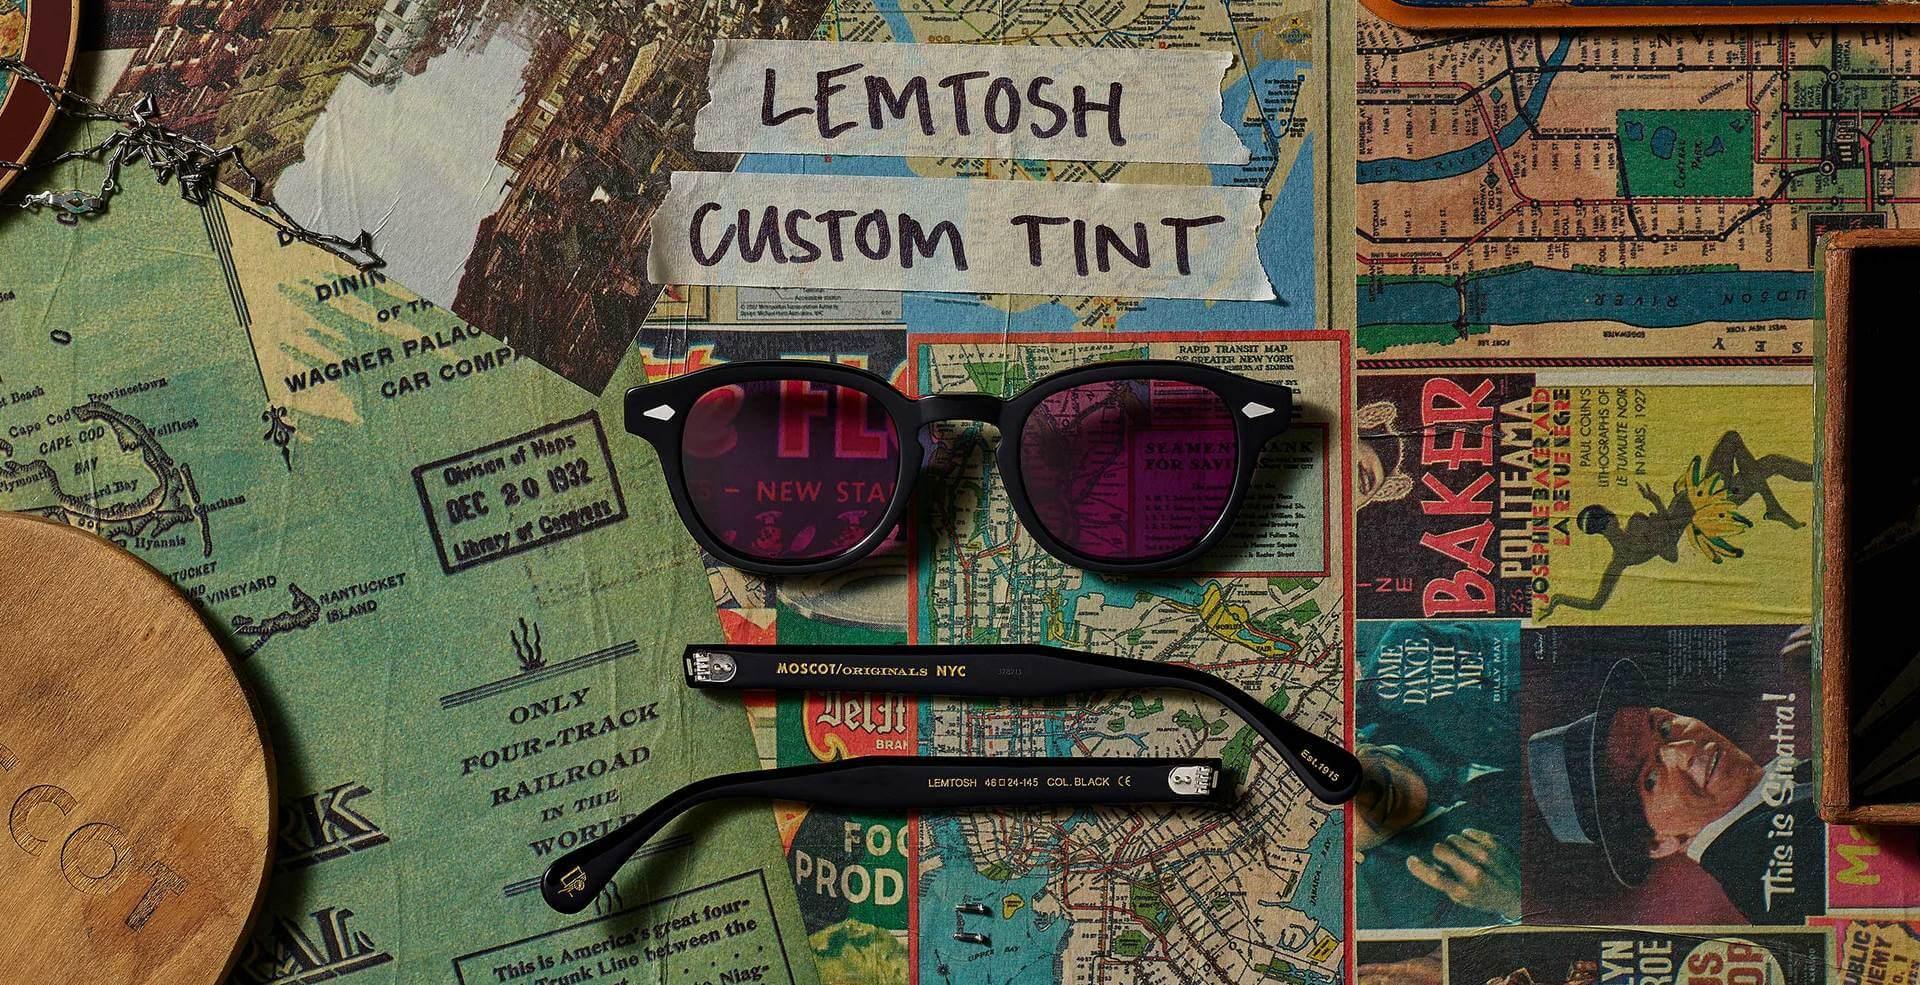 LEMTOSH Custom Tint